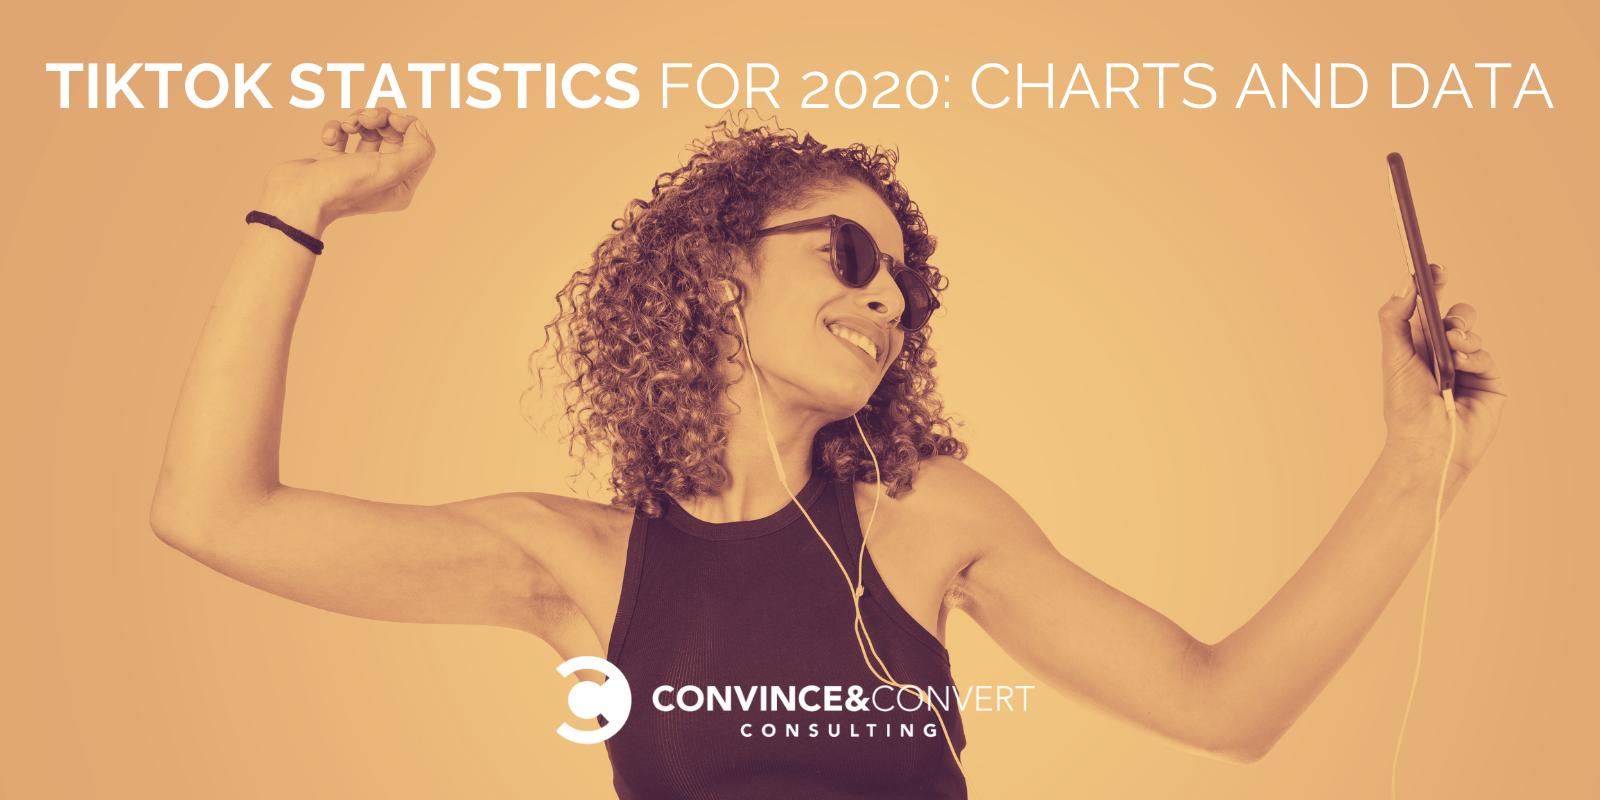 TikTok Statistics for 2020